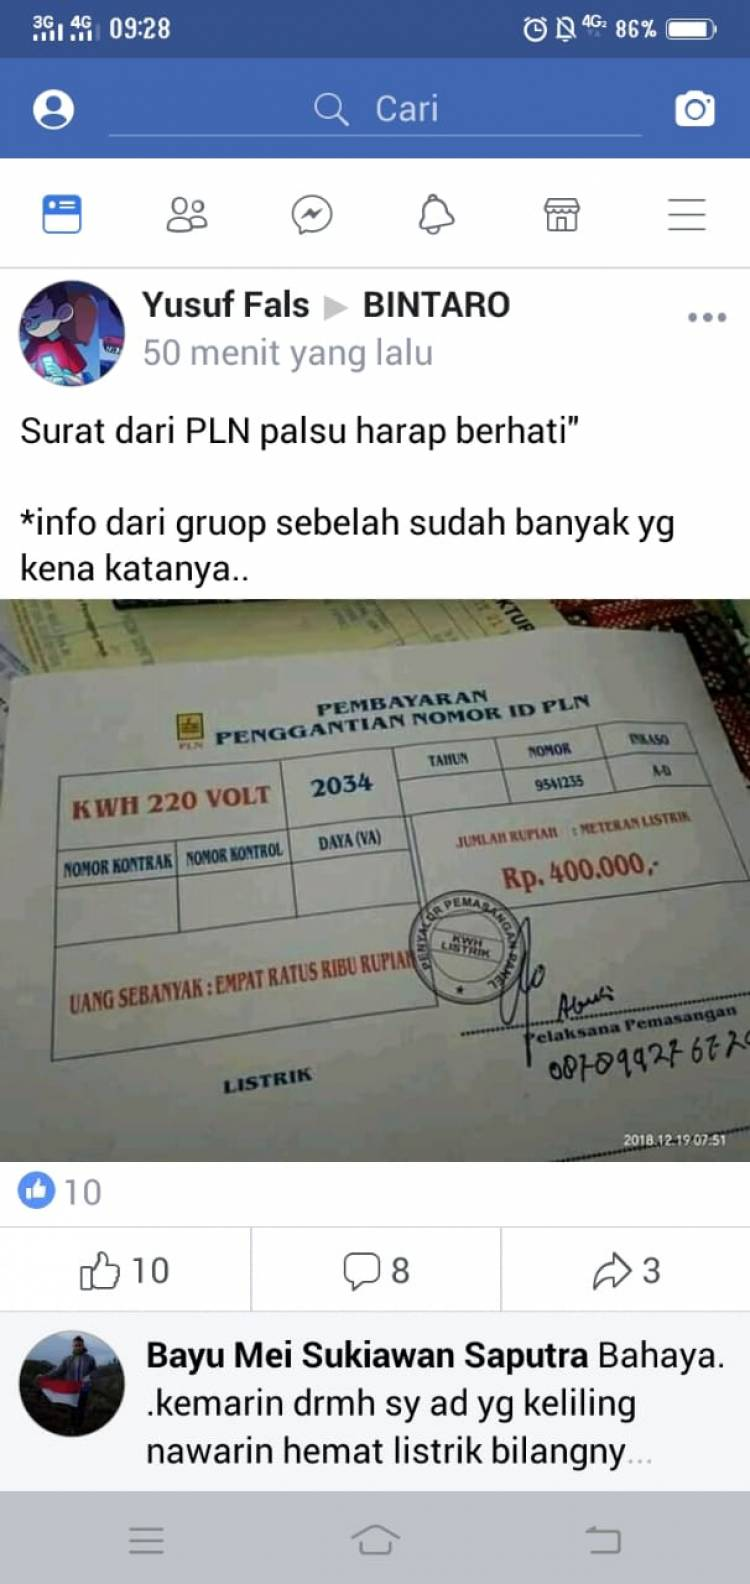 Warga Bintaro Resah, Diteror Surat Palsu Ngaku dari PLN